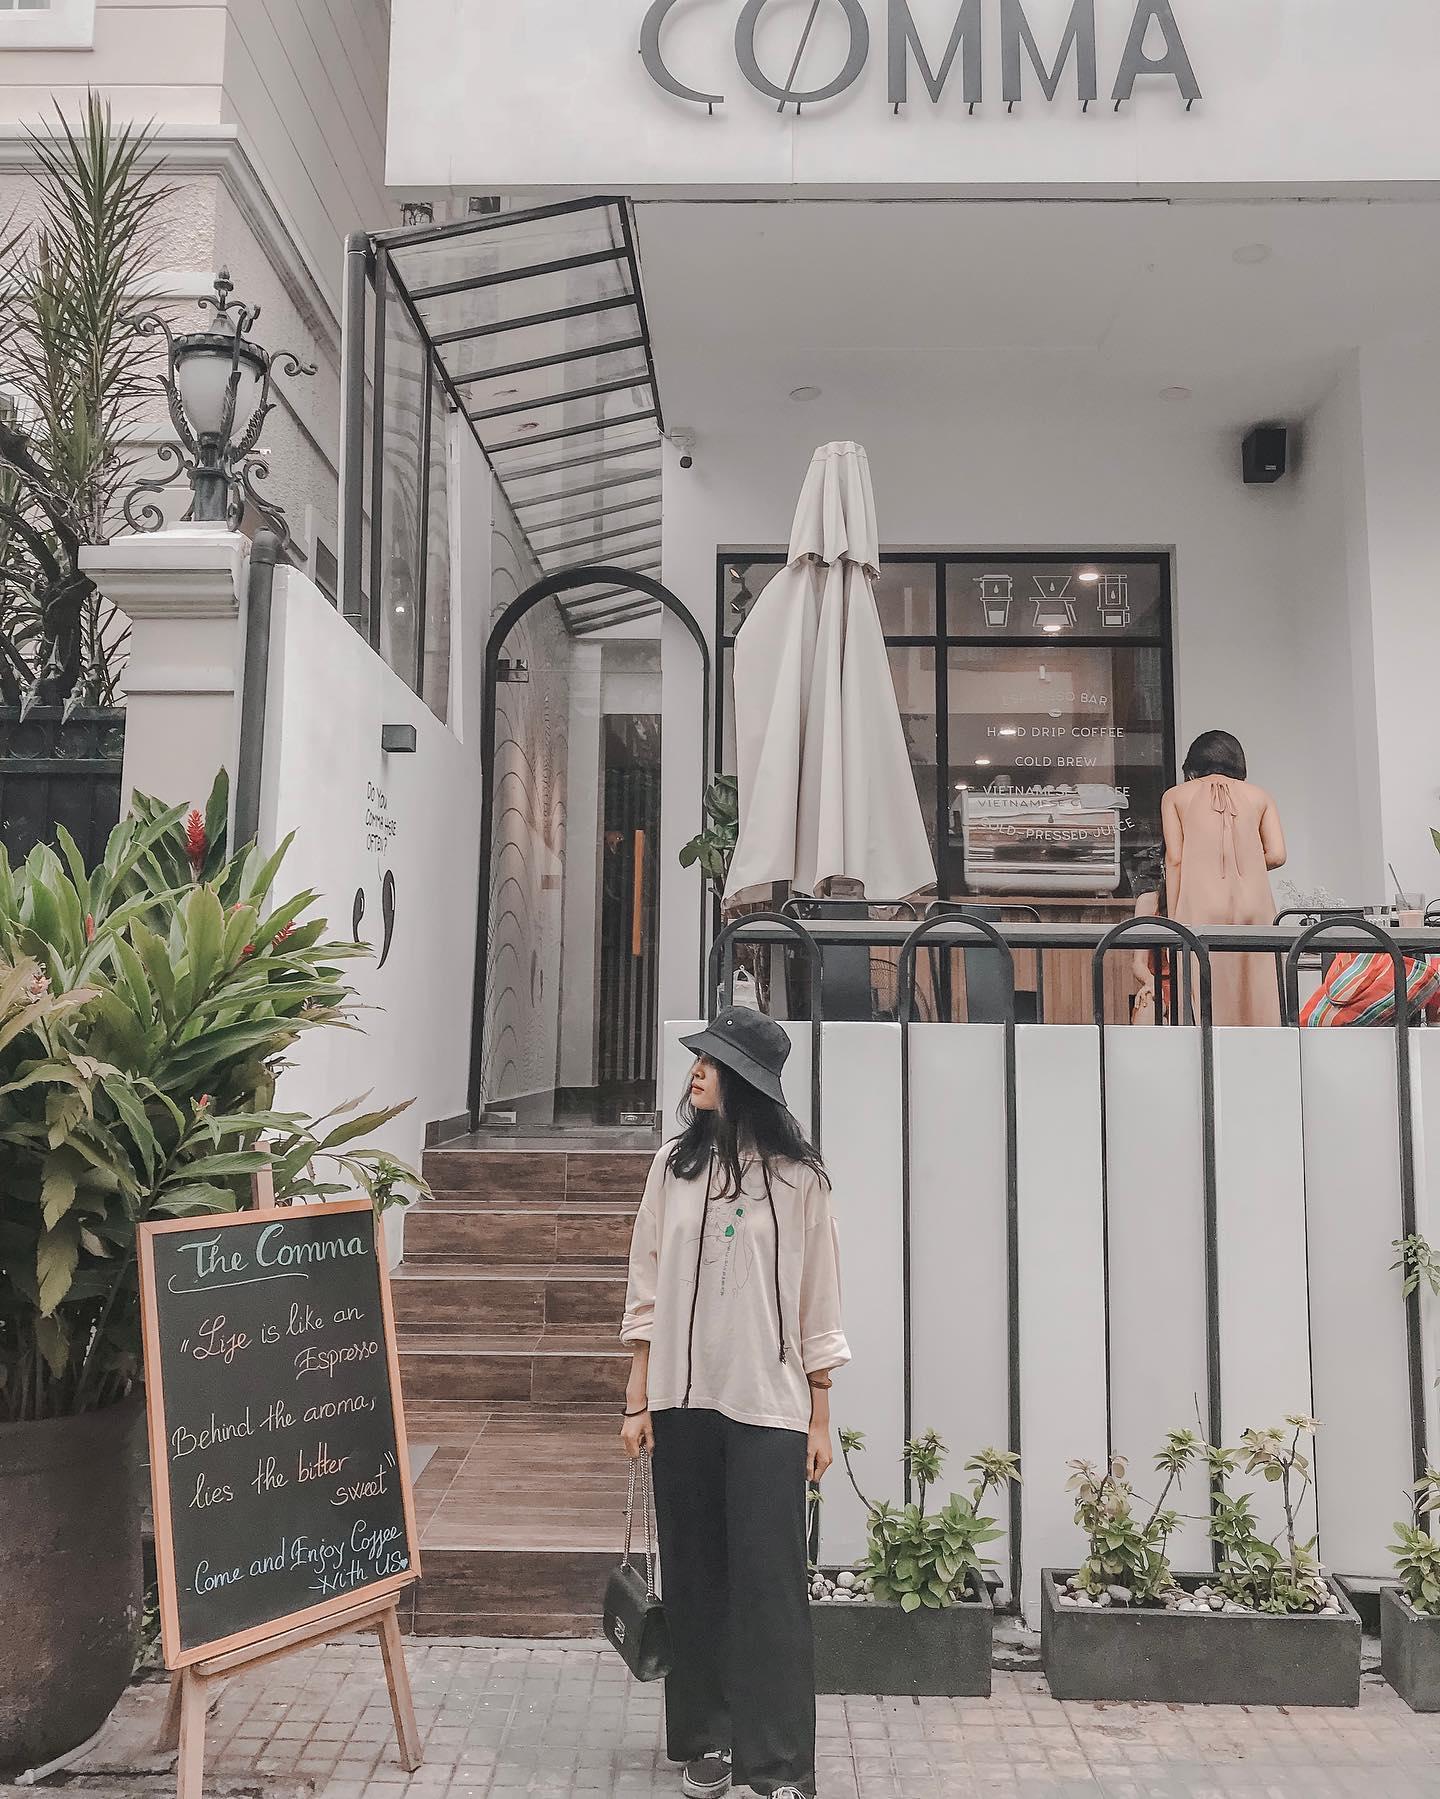 sai-gon-cafe-the-comma-coffee-5